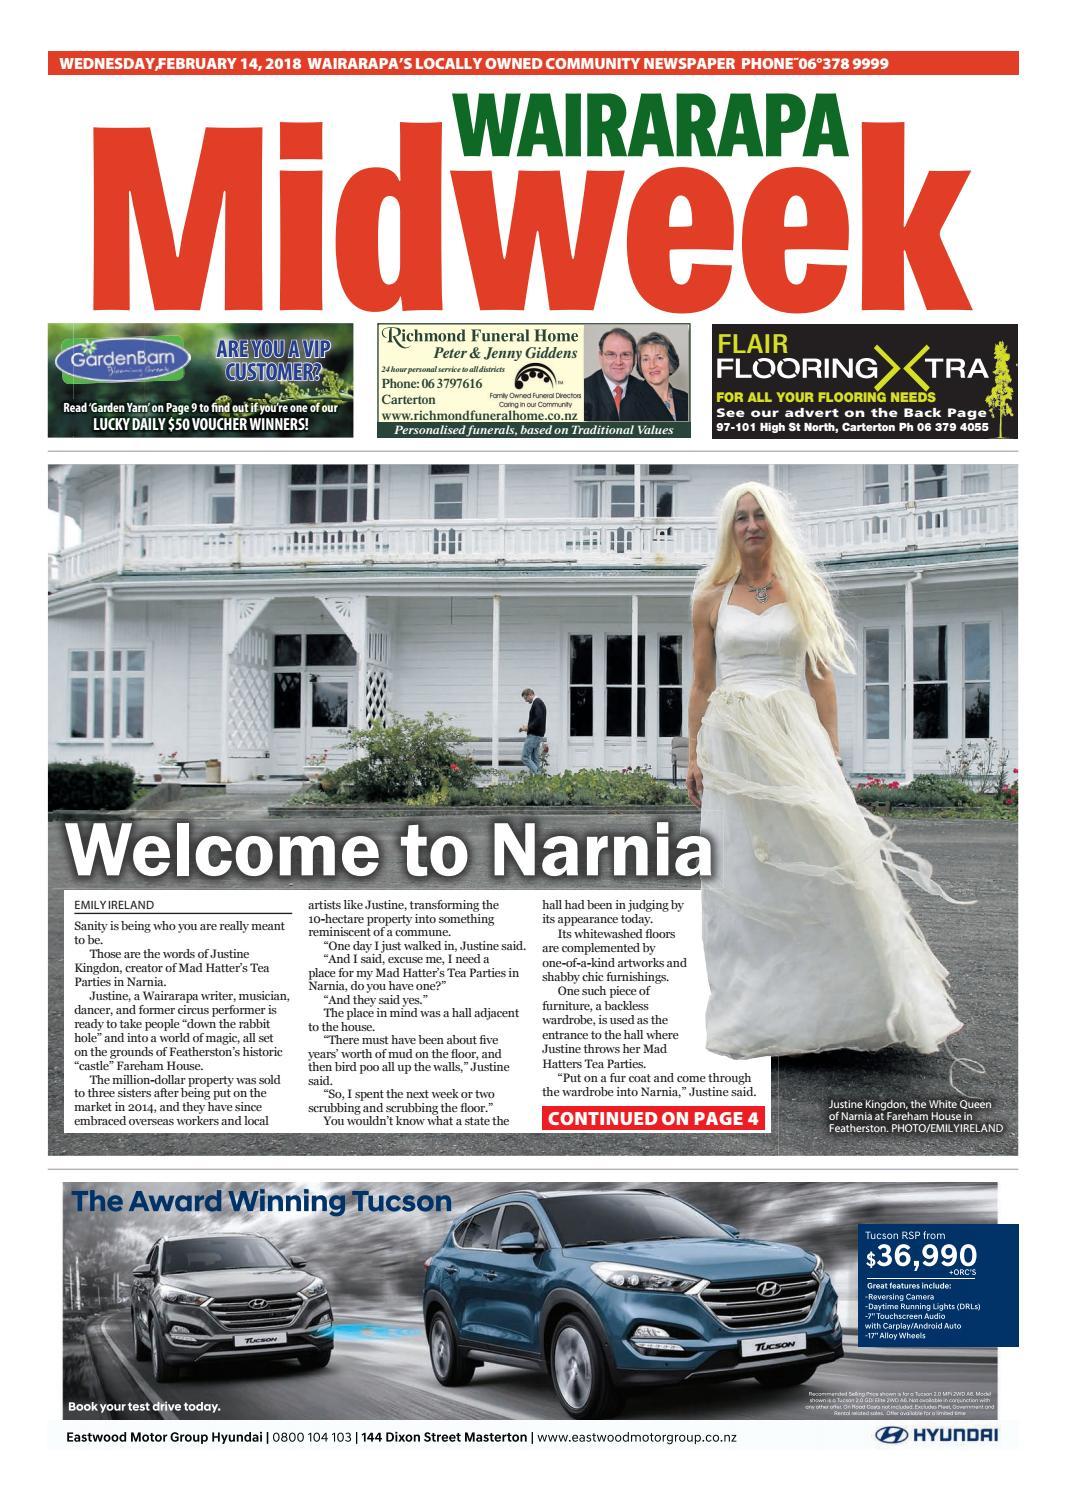 d00a3bff90 Wairarapa Midweek Wed 14th February by Wairarapa Times-Age - issuu